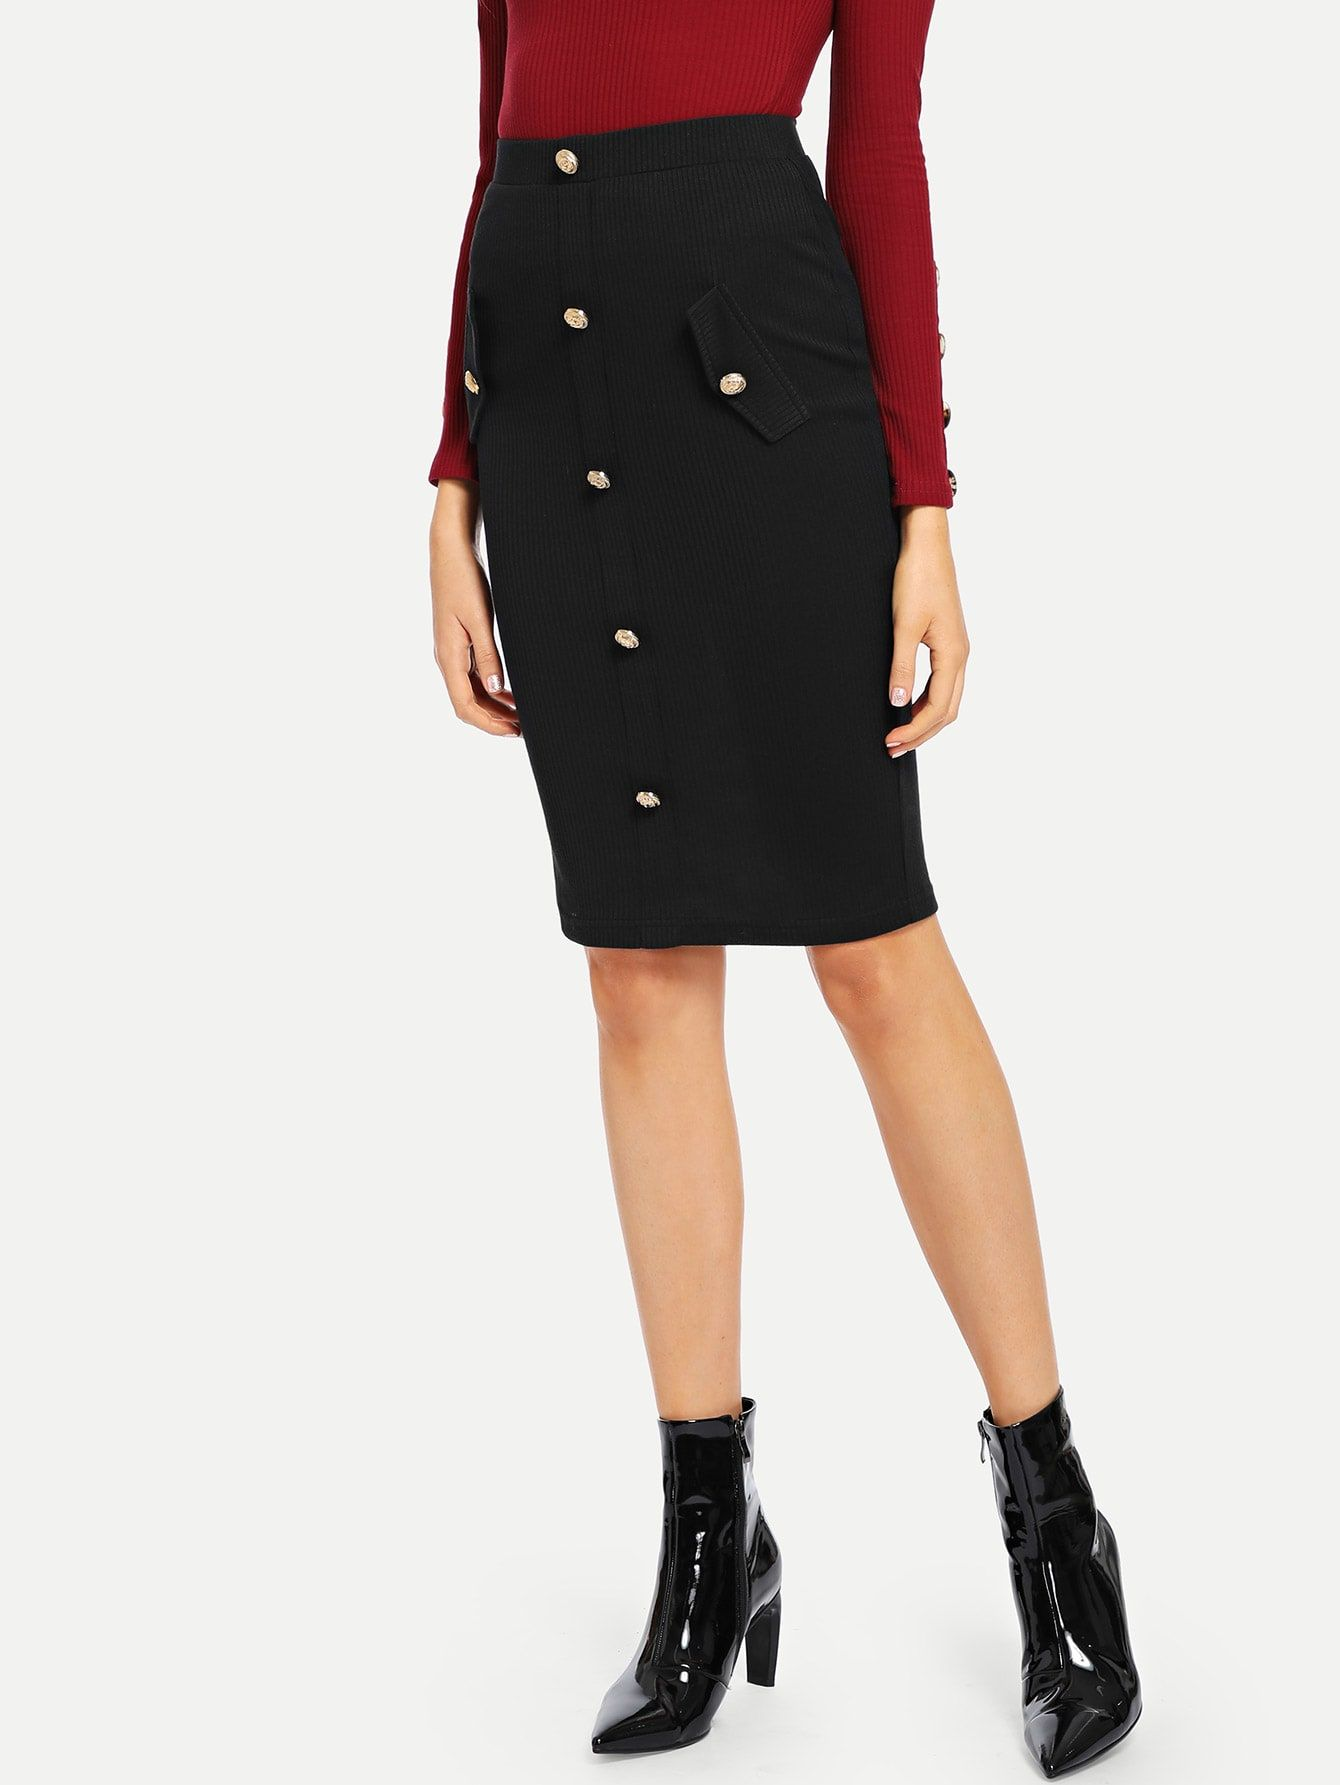 33e926c6384b Women Elegant and Classy Pencil Plain Bodycon High Waist Black Midi Length  Gold Button Detail Rib Knit Pencil Skirt